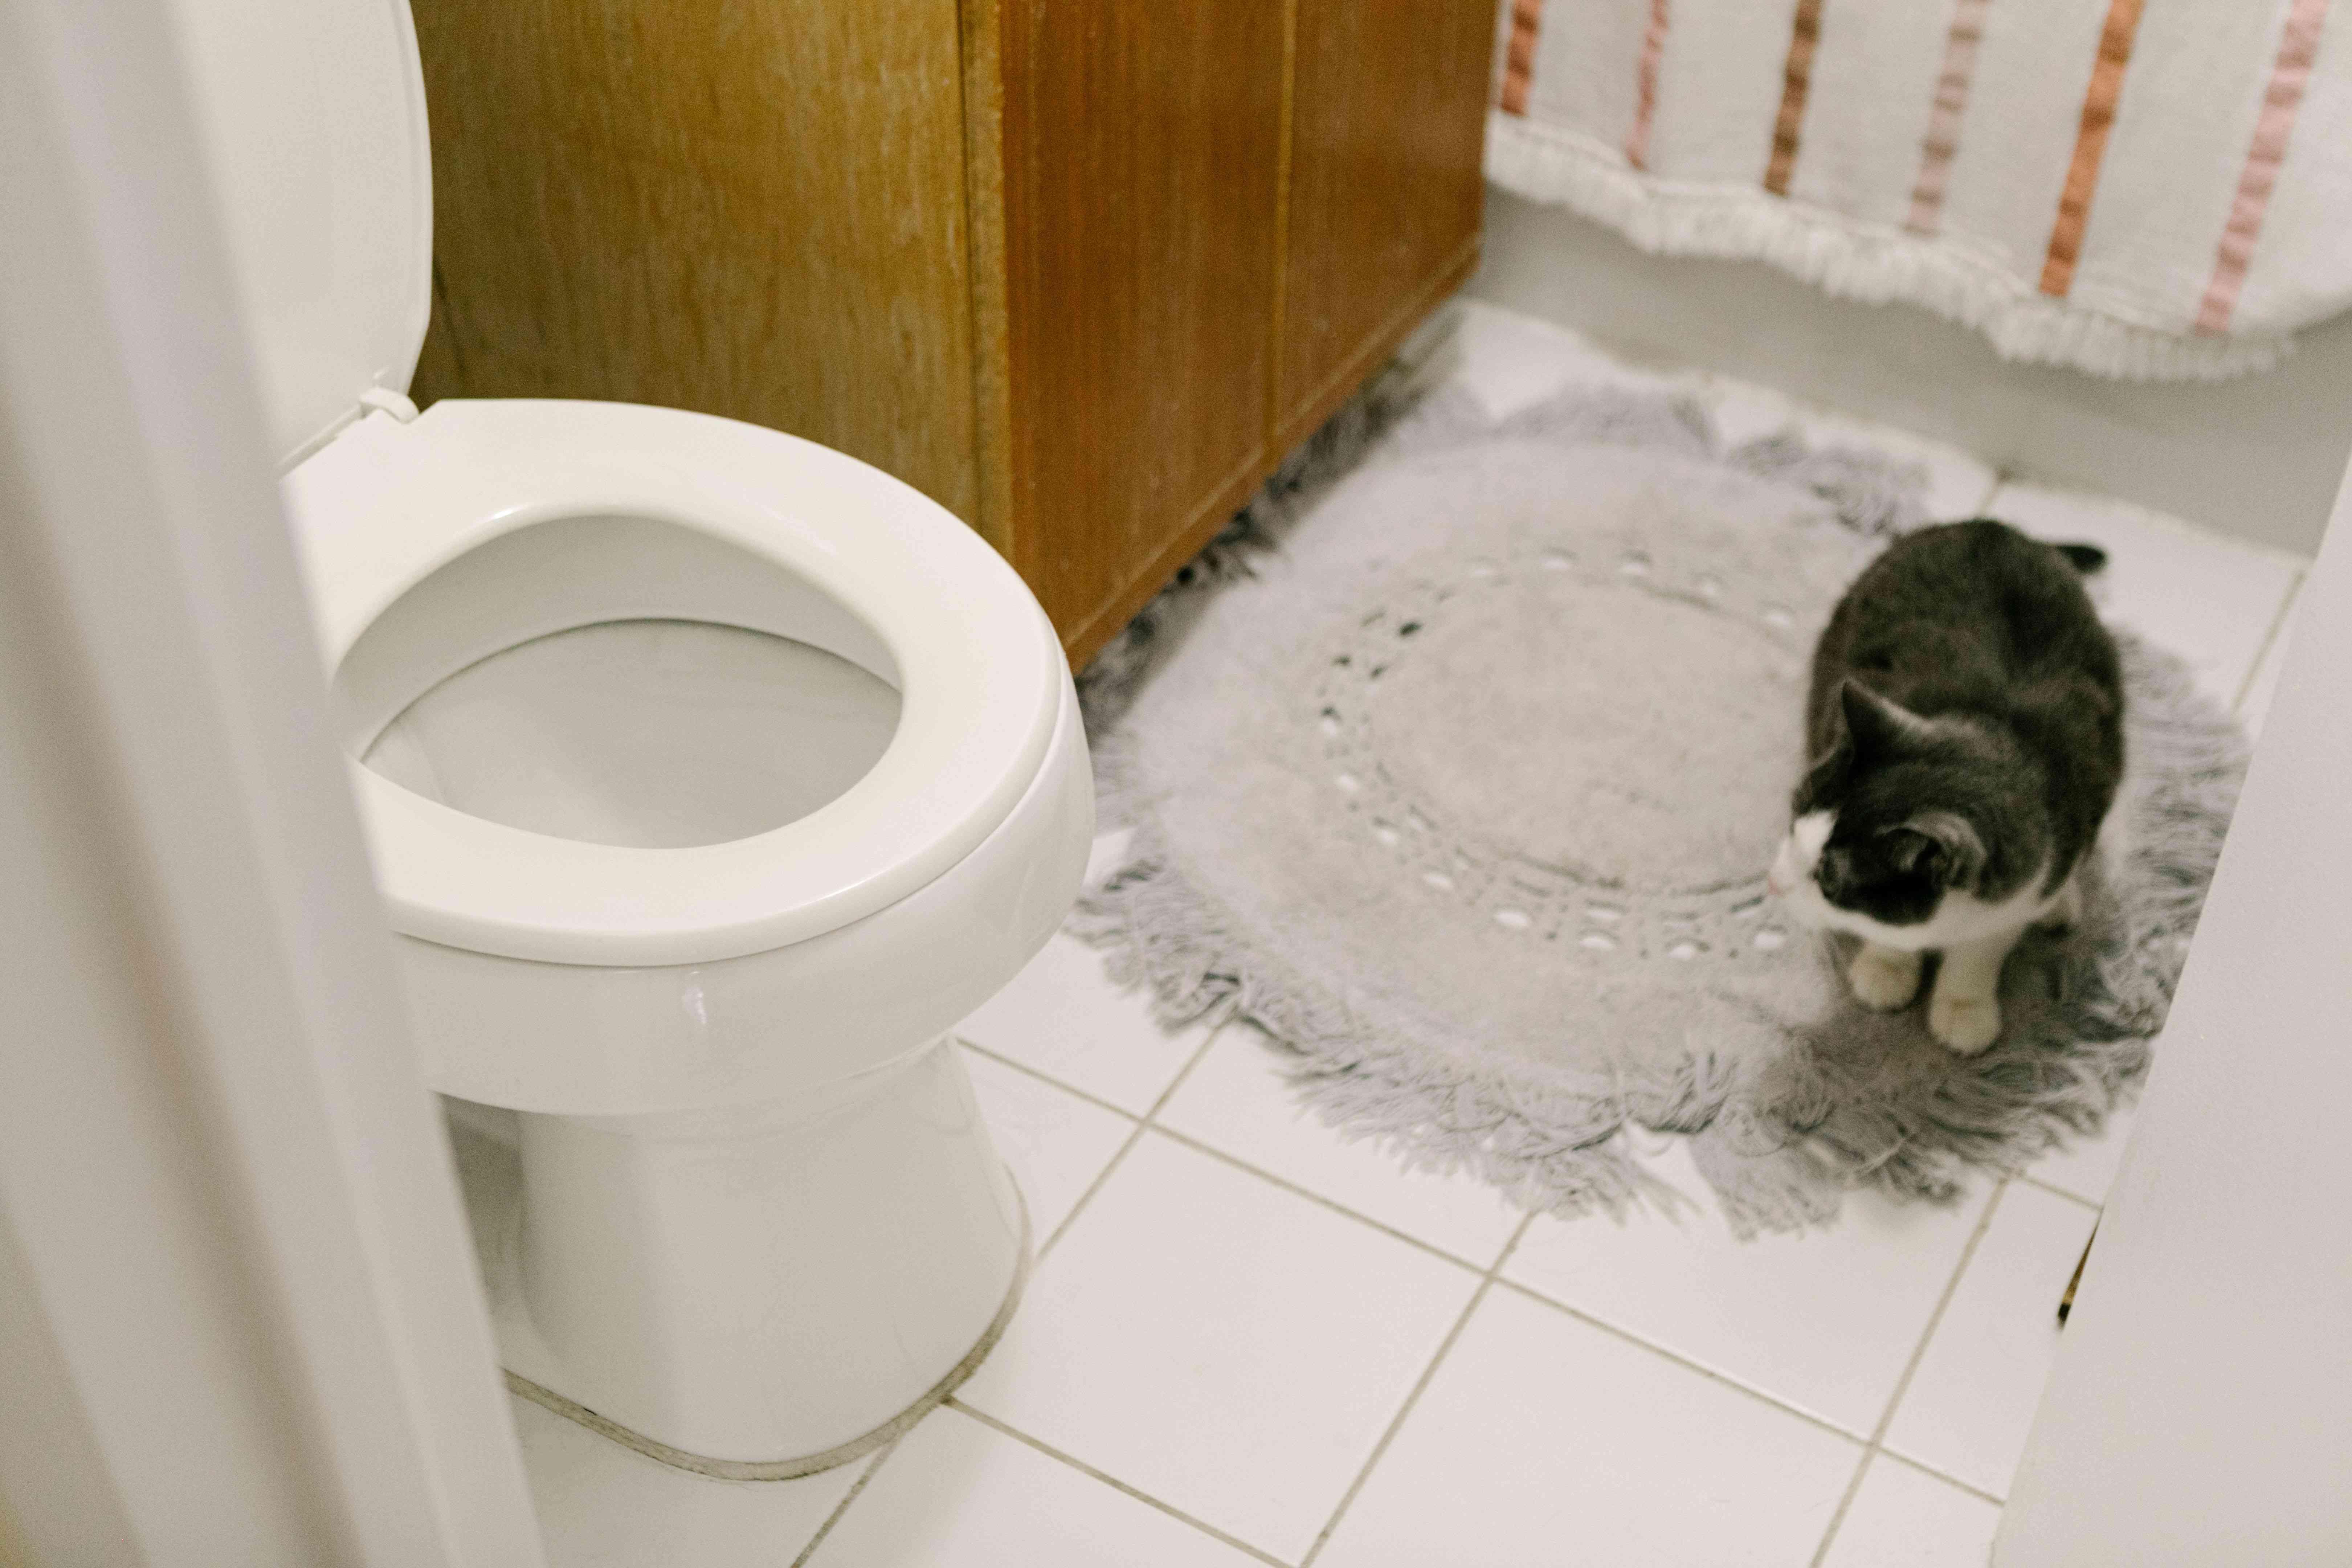 cat studies toilet while sitting on gray rug in bathroom